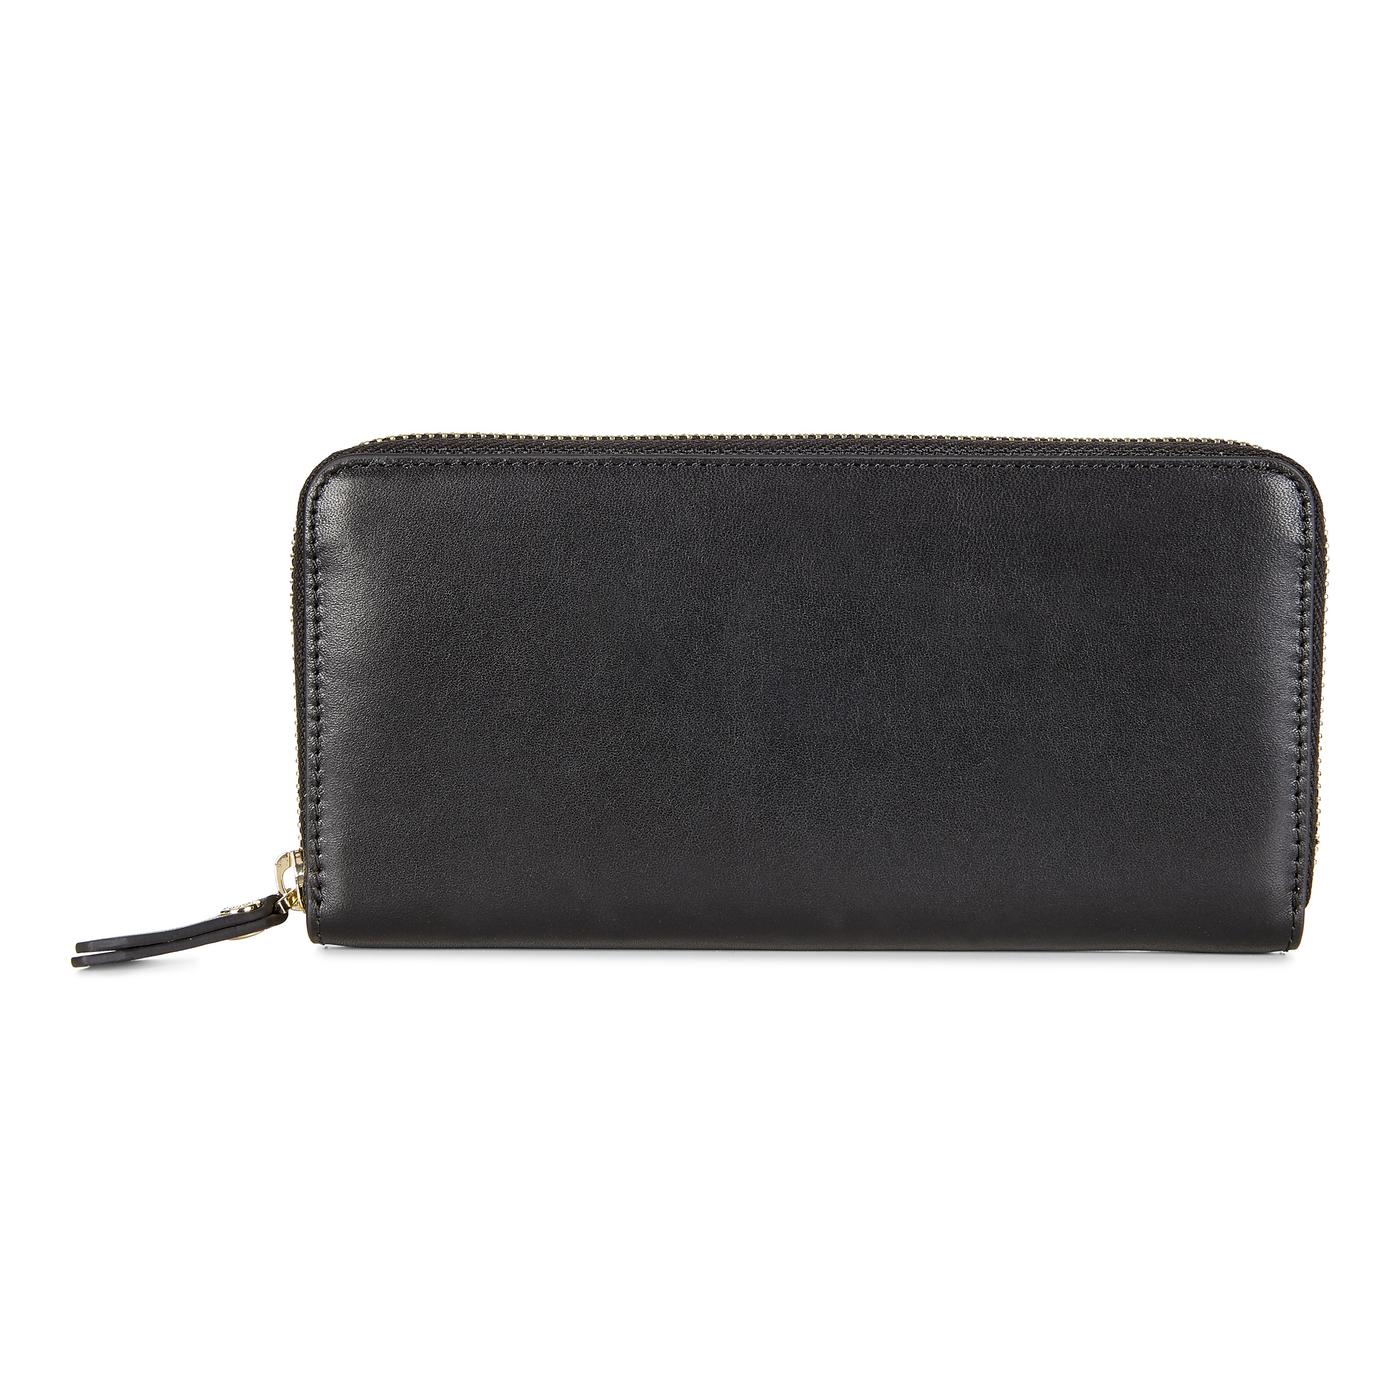 ECCO Kauai Large Zip Wallet